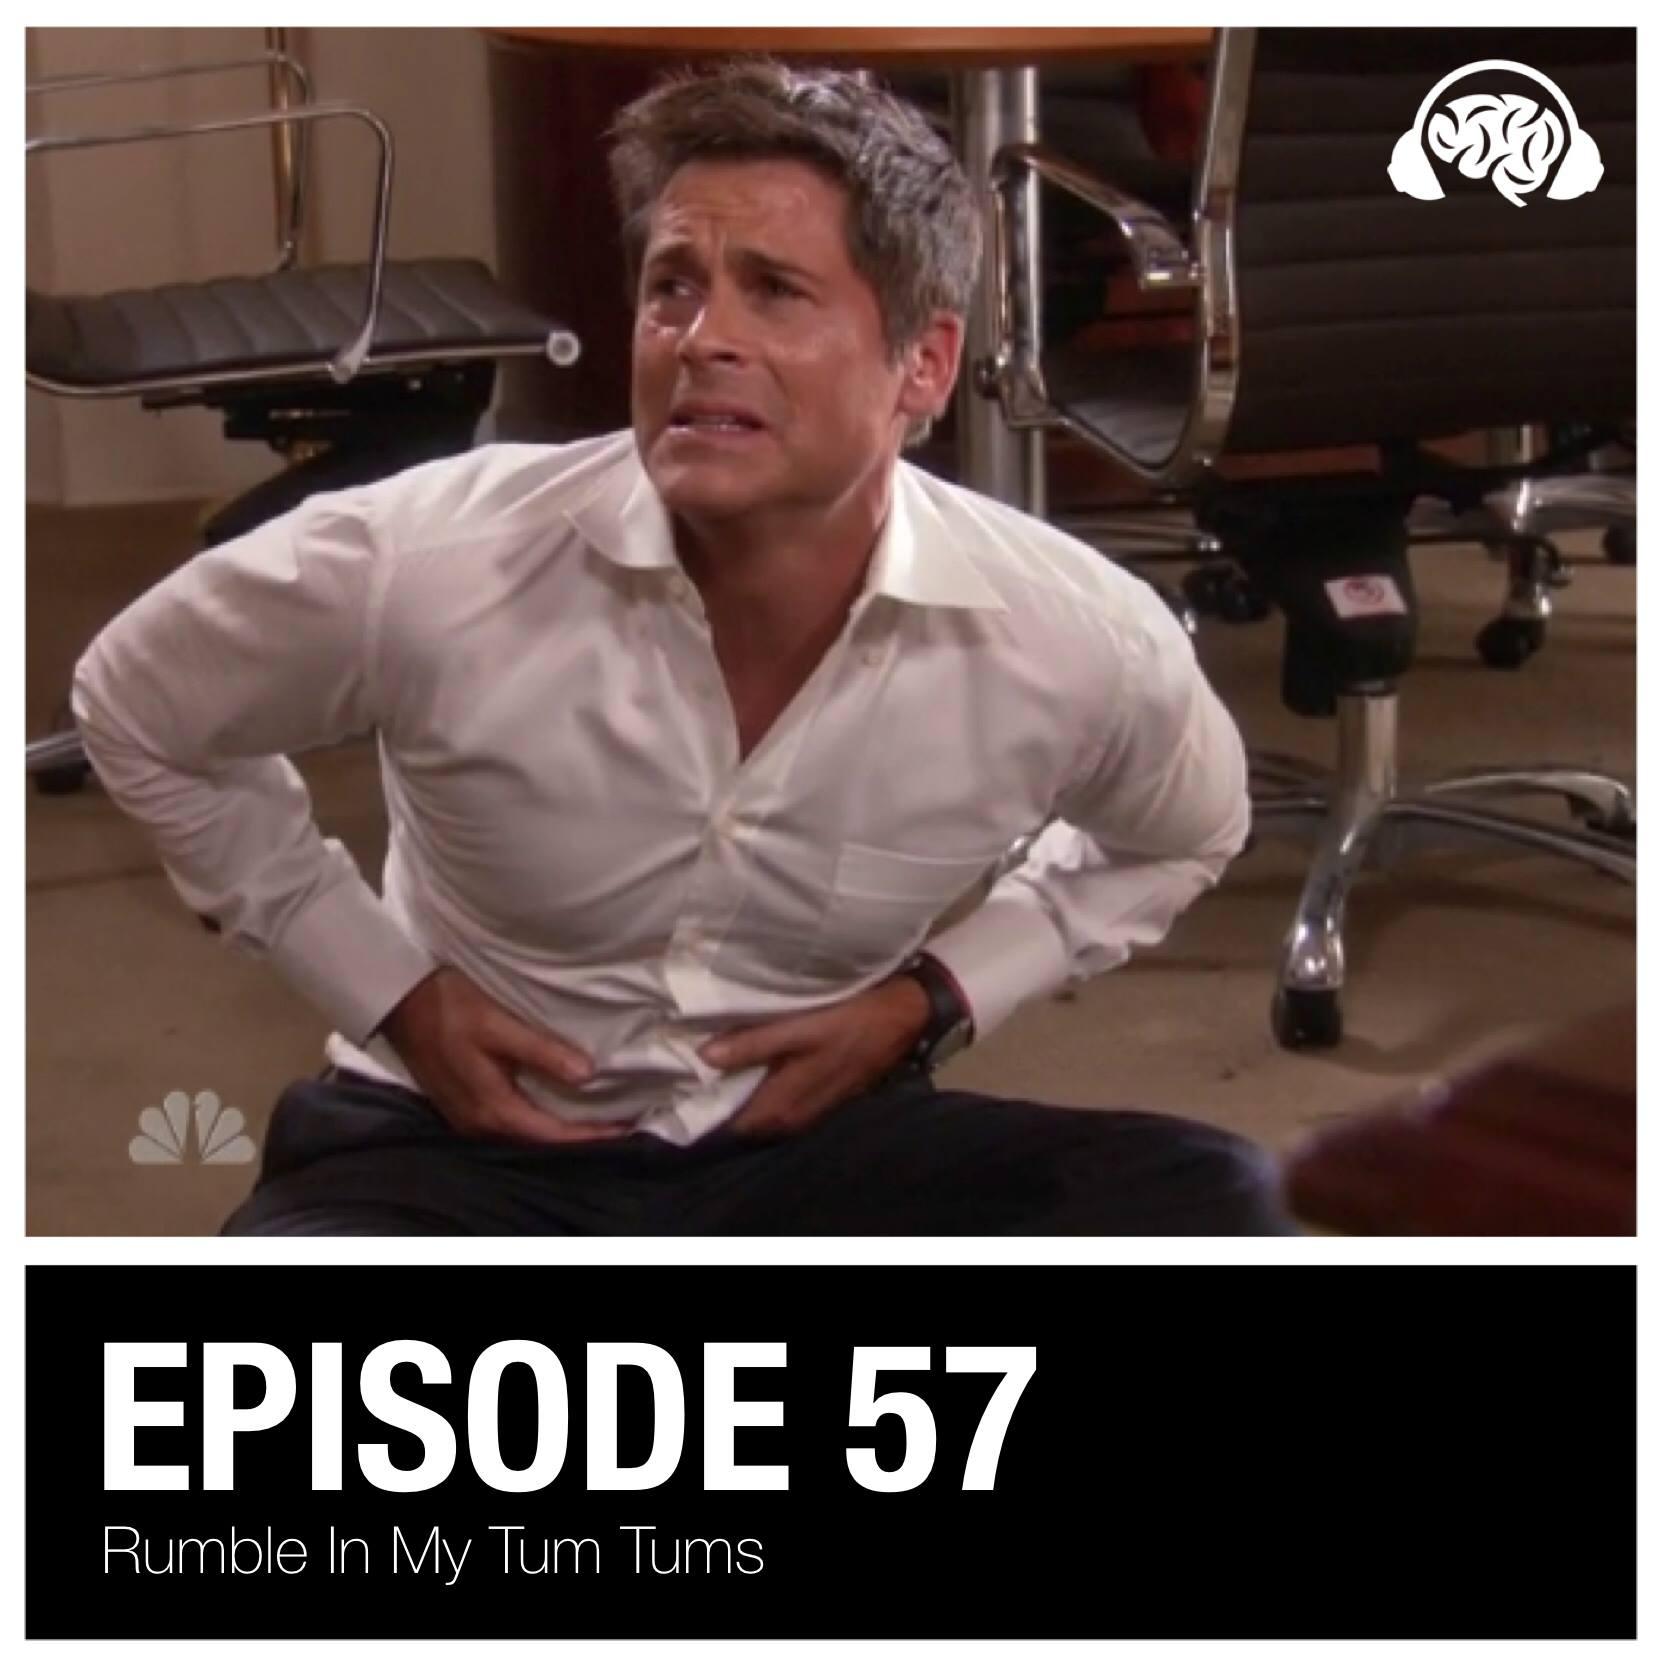 episode57.jpg